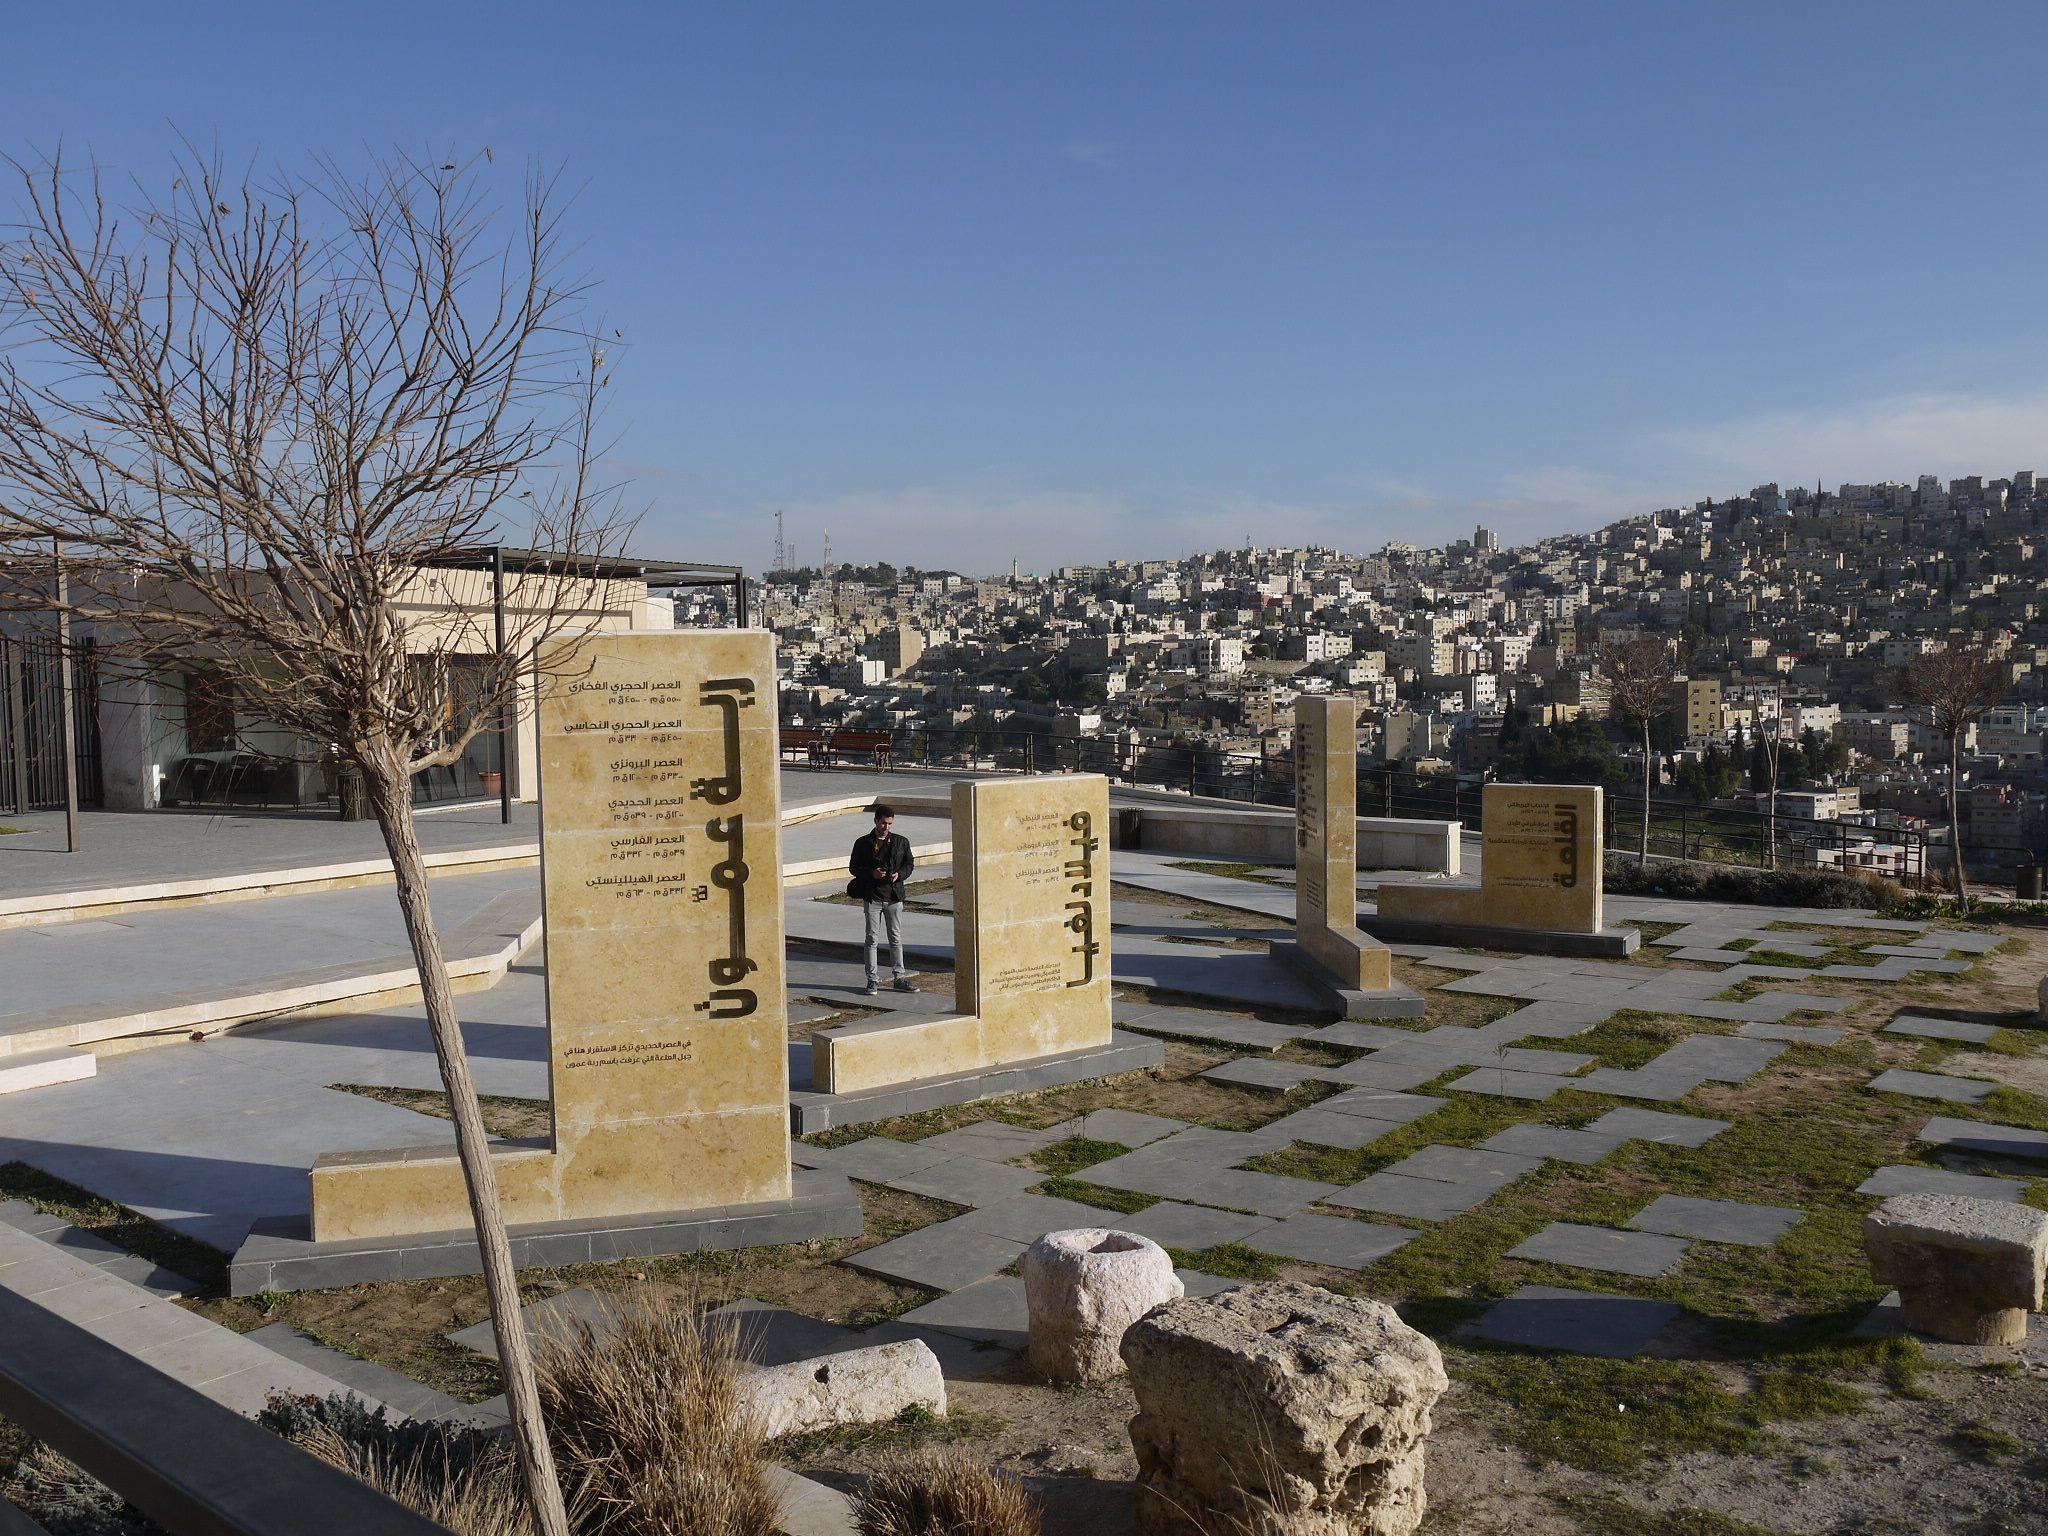 Amman Citadel Urban Historic Park, Jordan